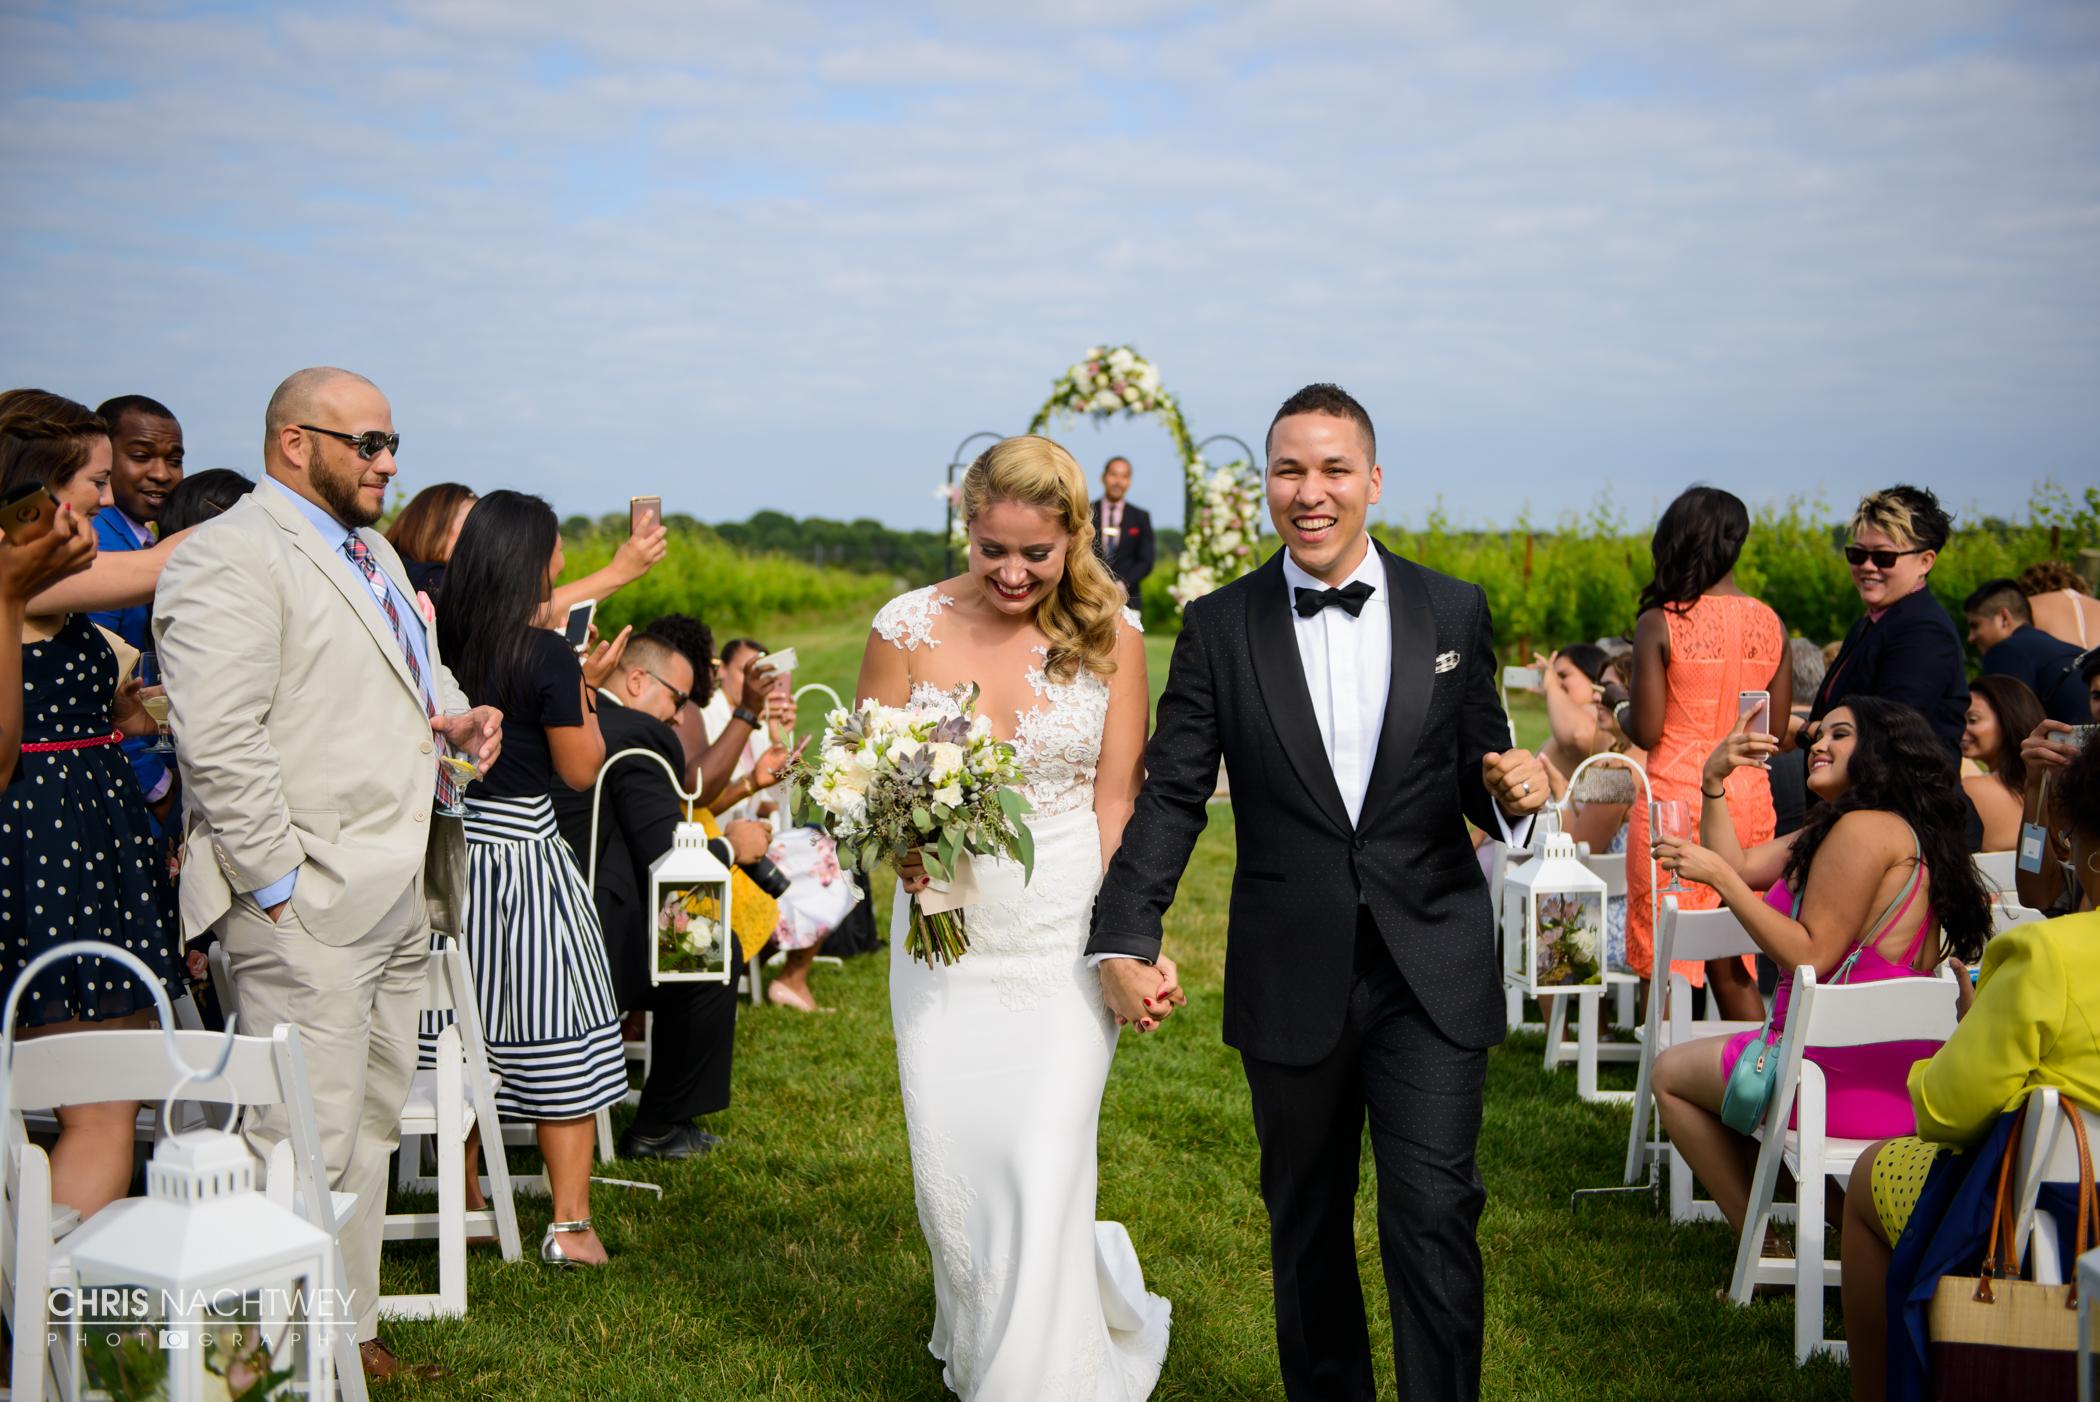 wedding-saltwater-farm-vineyard-photos-stonington-ct-chris-nachtwey-photography-2016-ana-austin-24.jpg